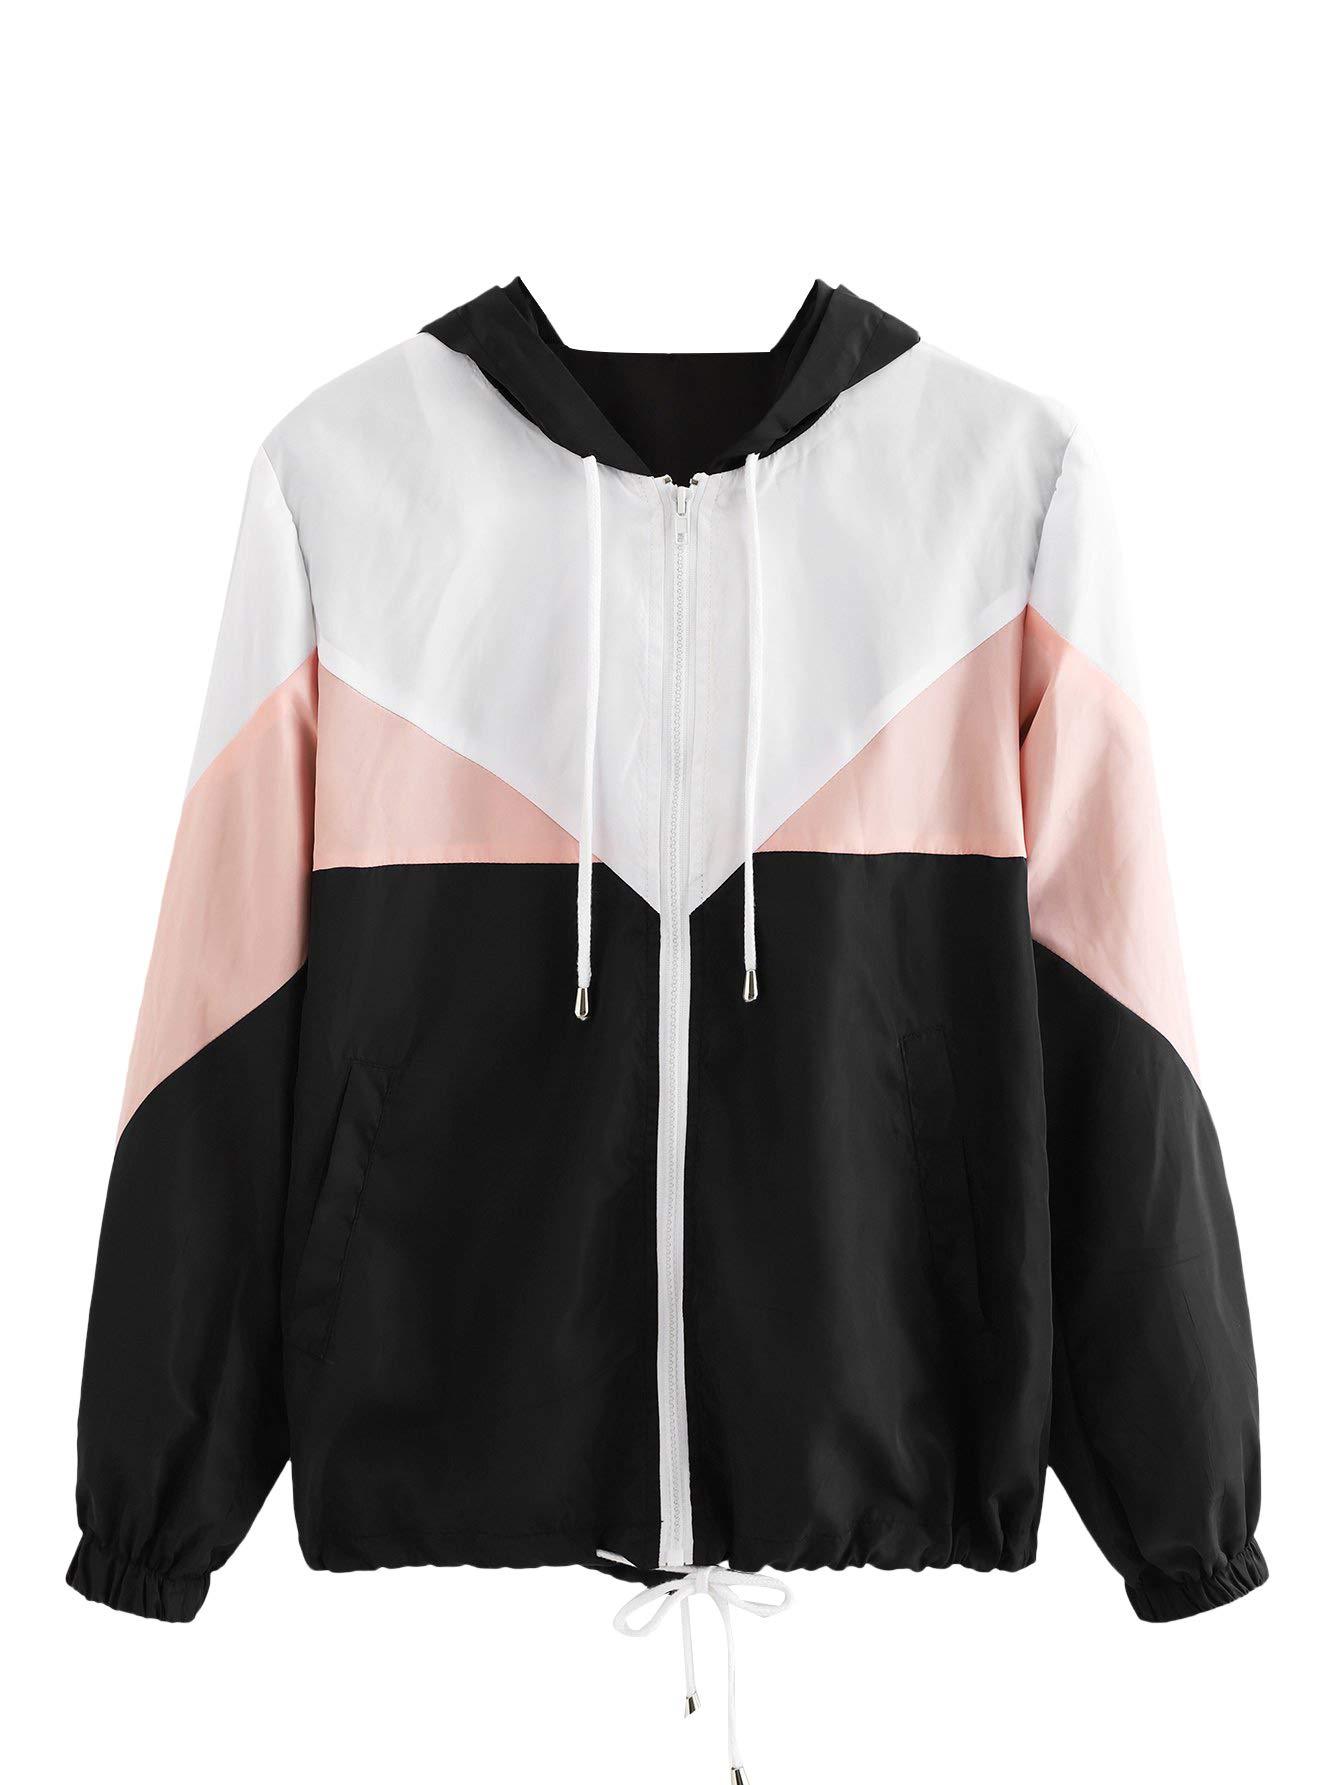 Milumia Women's Color Block Drawstring Hooded Zip Up Sports Jacket Windproof Windbreaker X-Large Multicolor